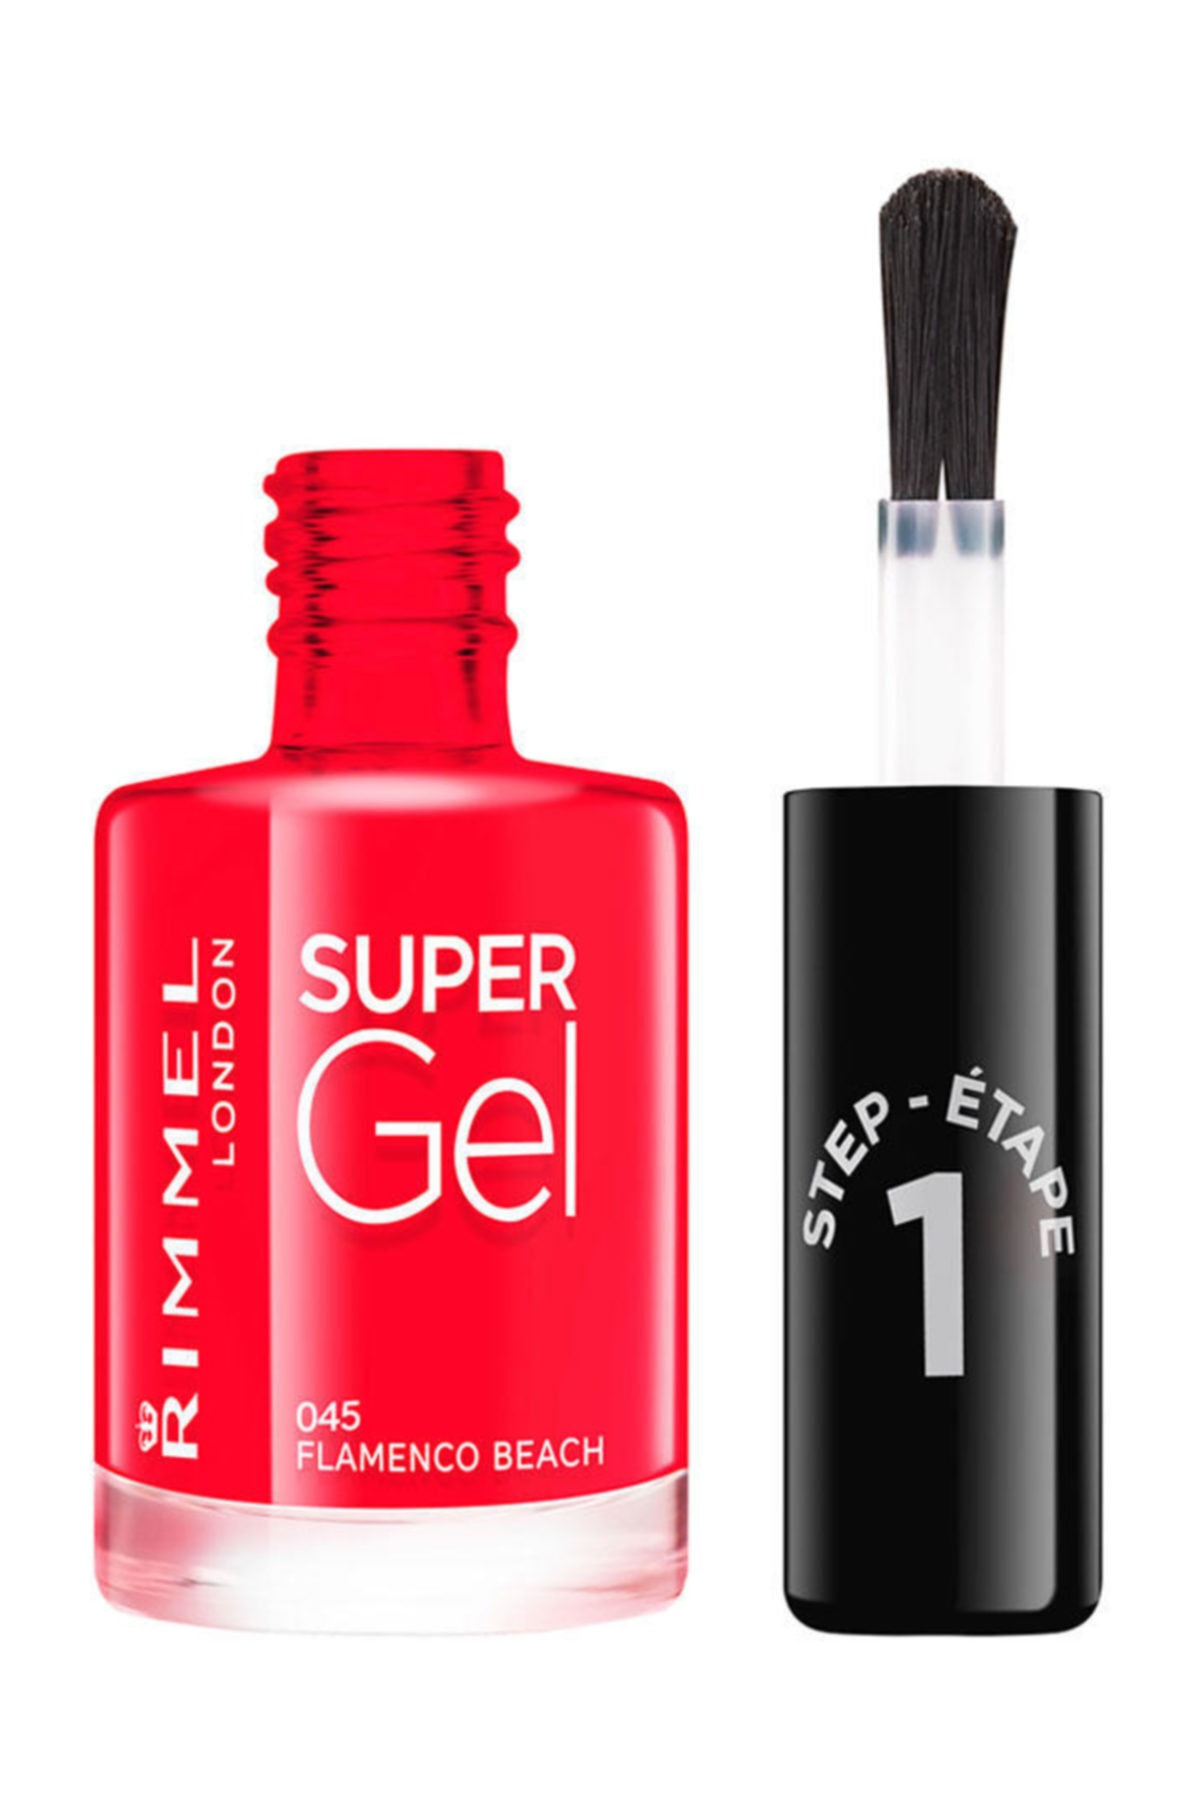 RIMMEL LONDON Oje - Super Gel 045 Flamenco Beach 12 ml 30121645 1